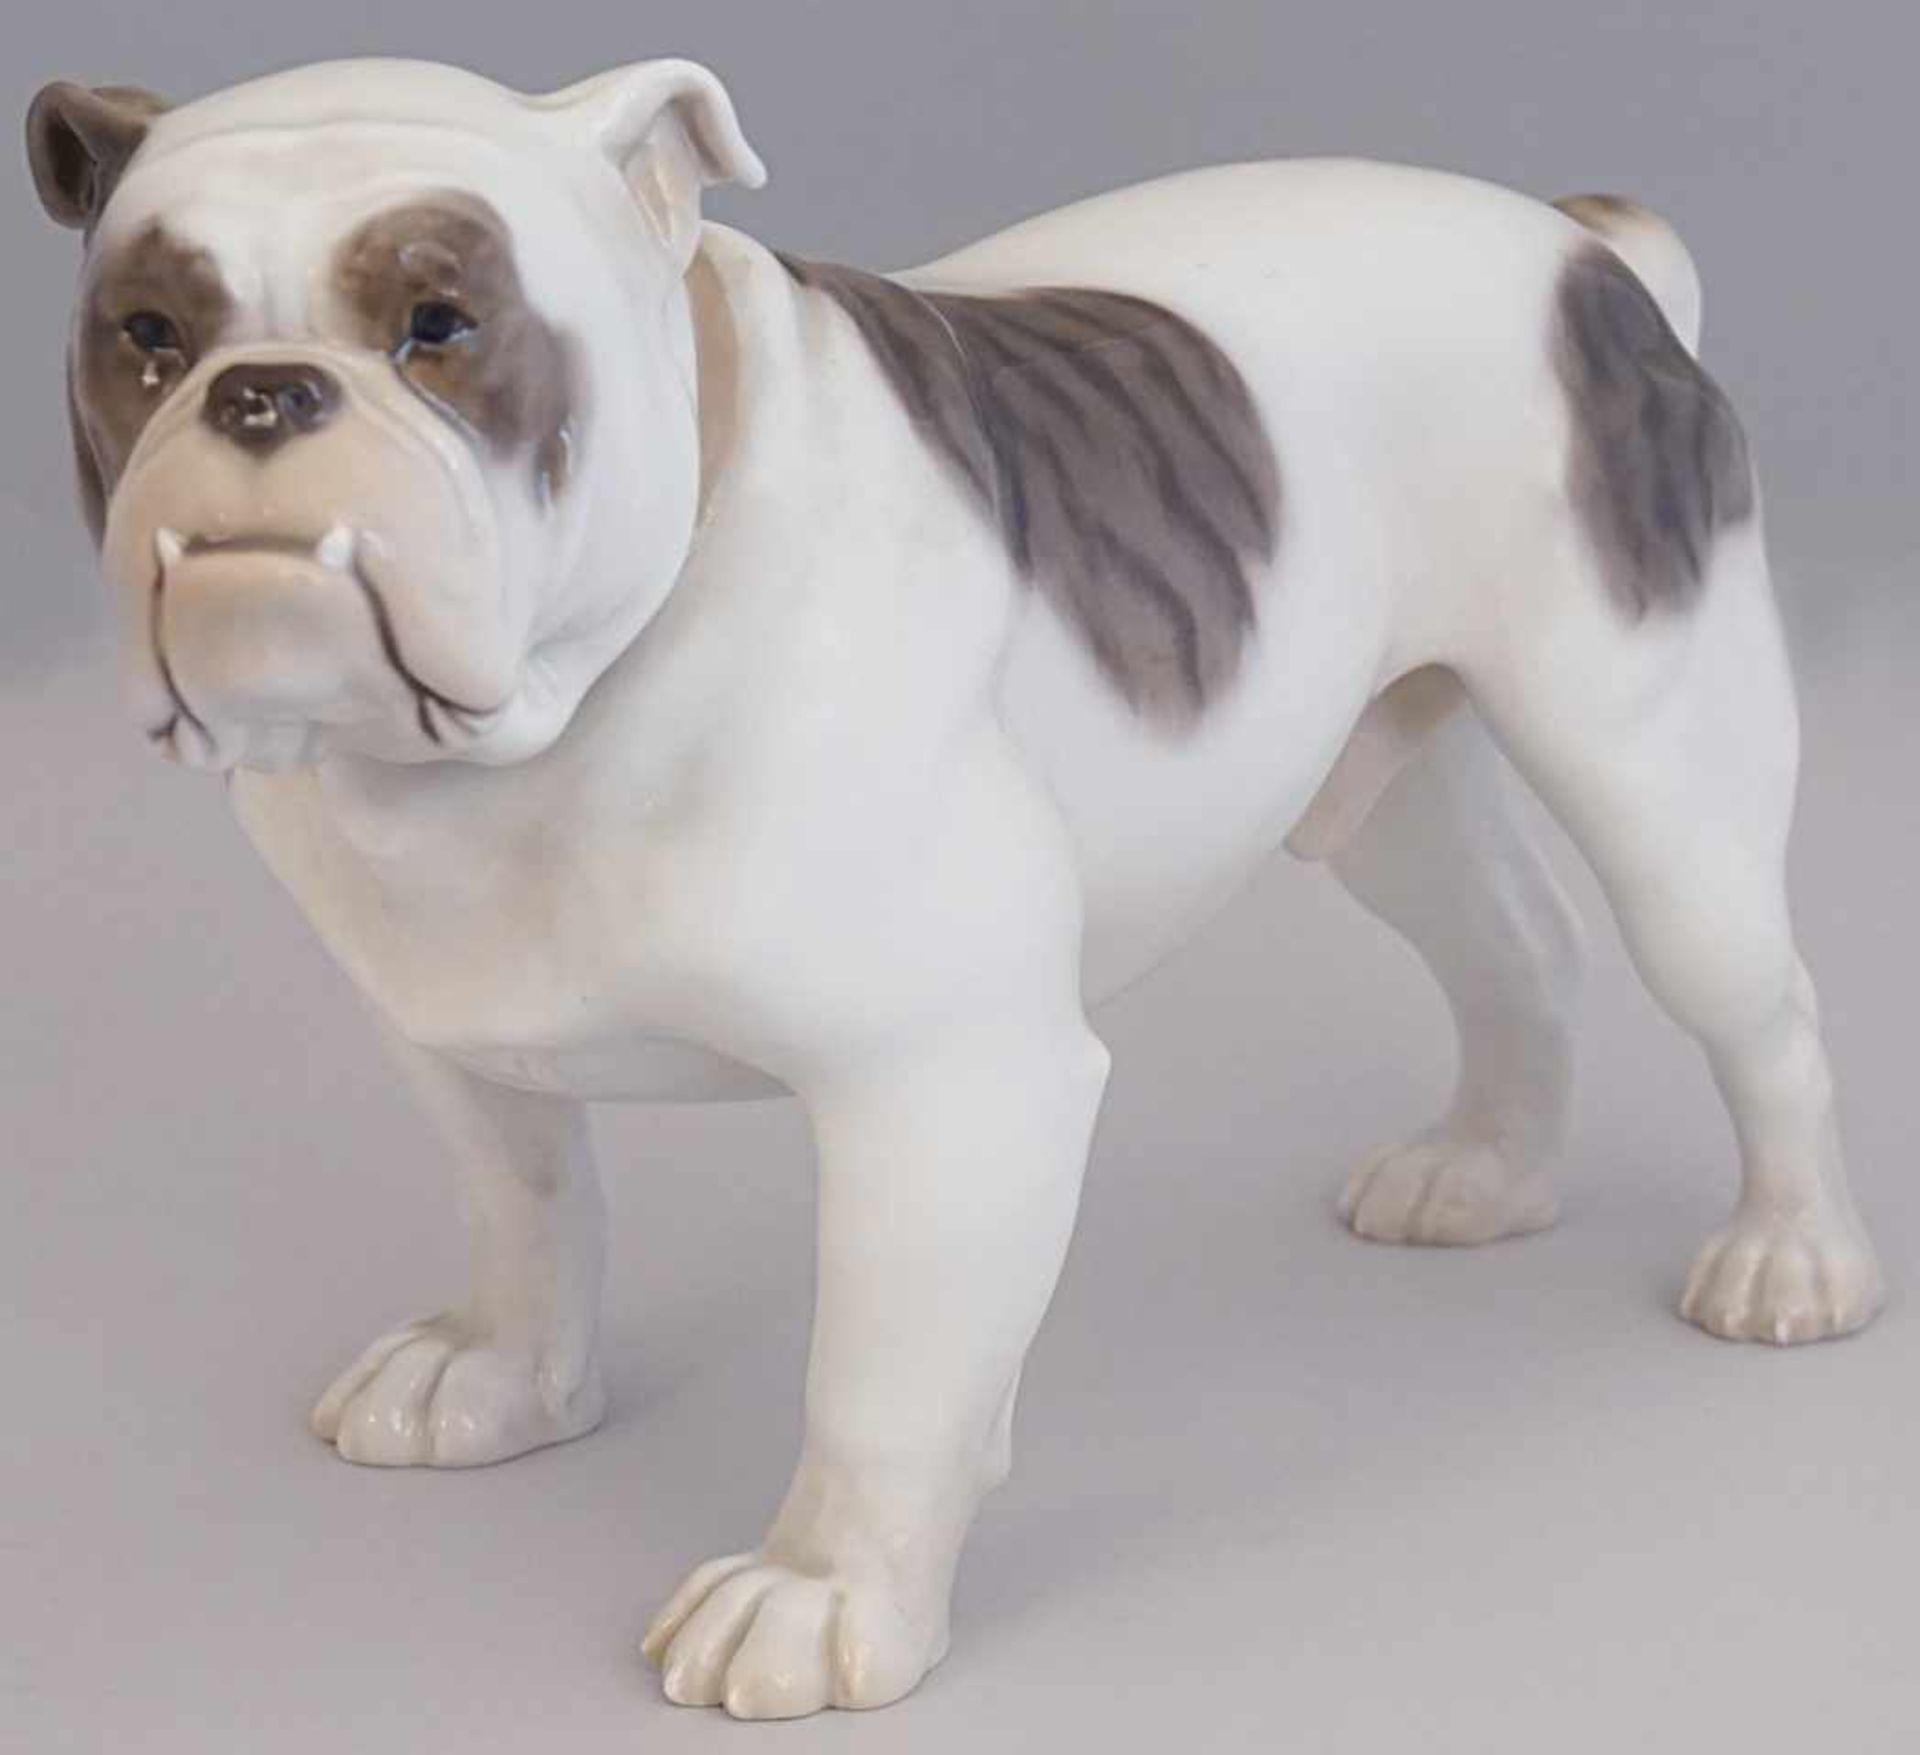 "Figur Porzellan BING & GRONDAHL Dänemark ""Englische Bulldogge""Entwurf wohl DAHL Jensen"